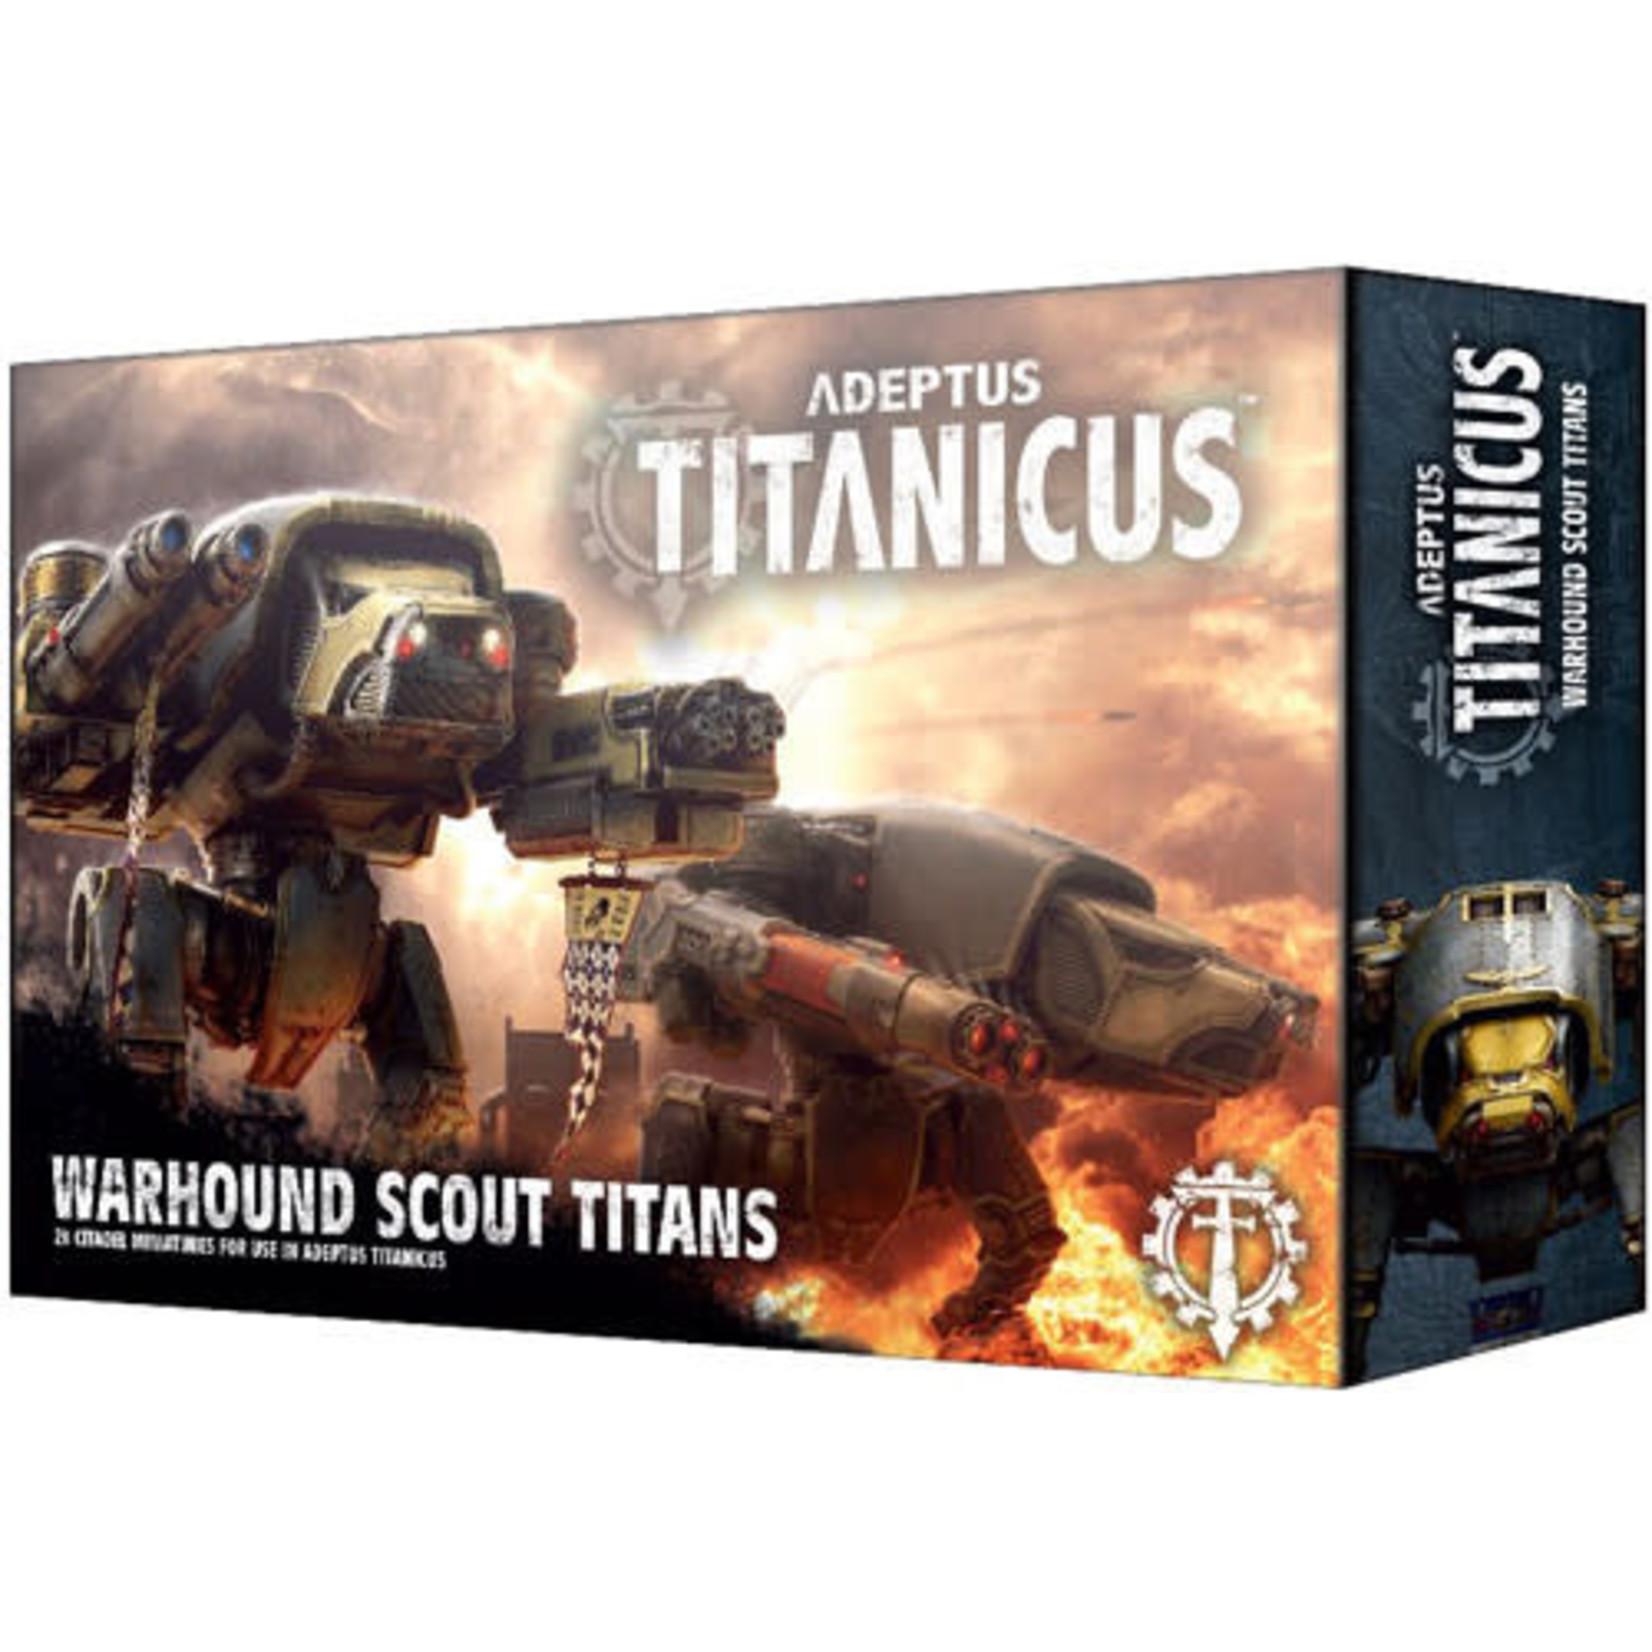 Adeptus Titanicus Warhound